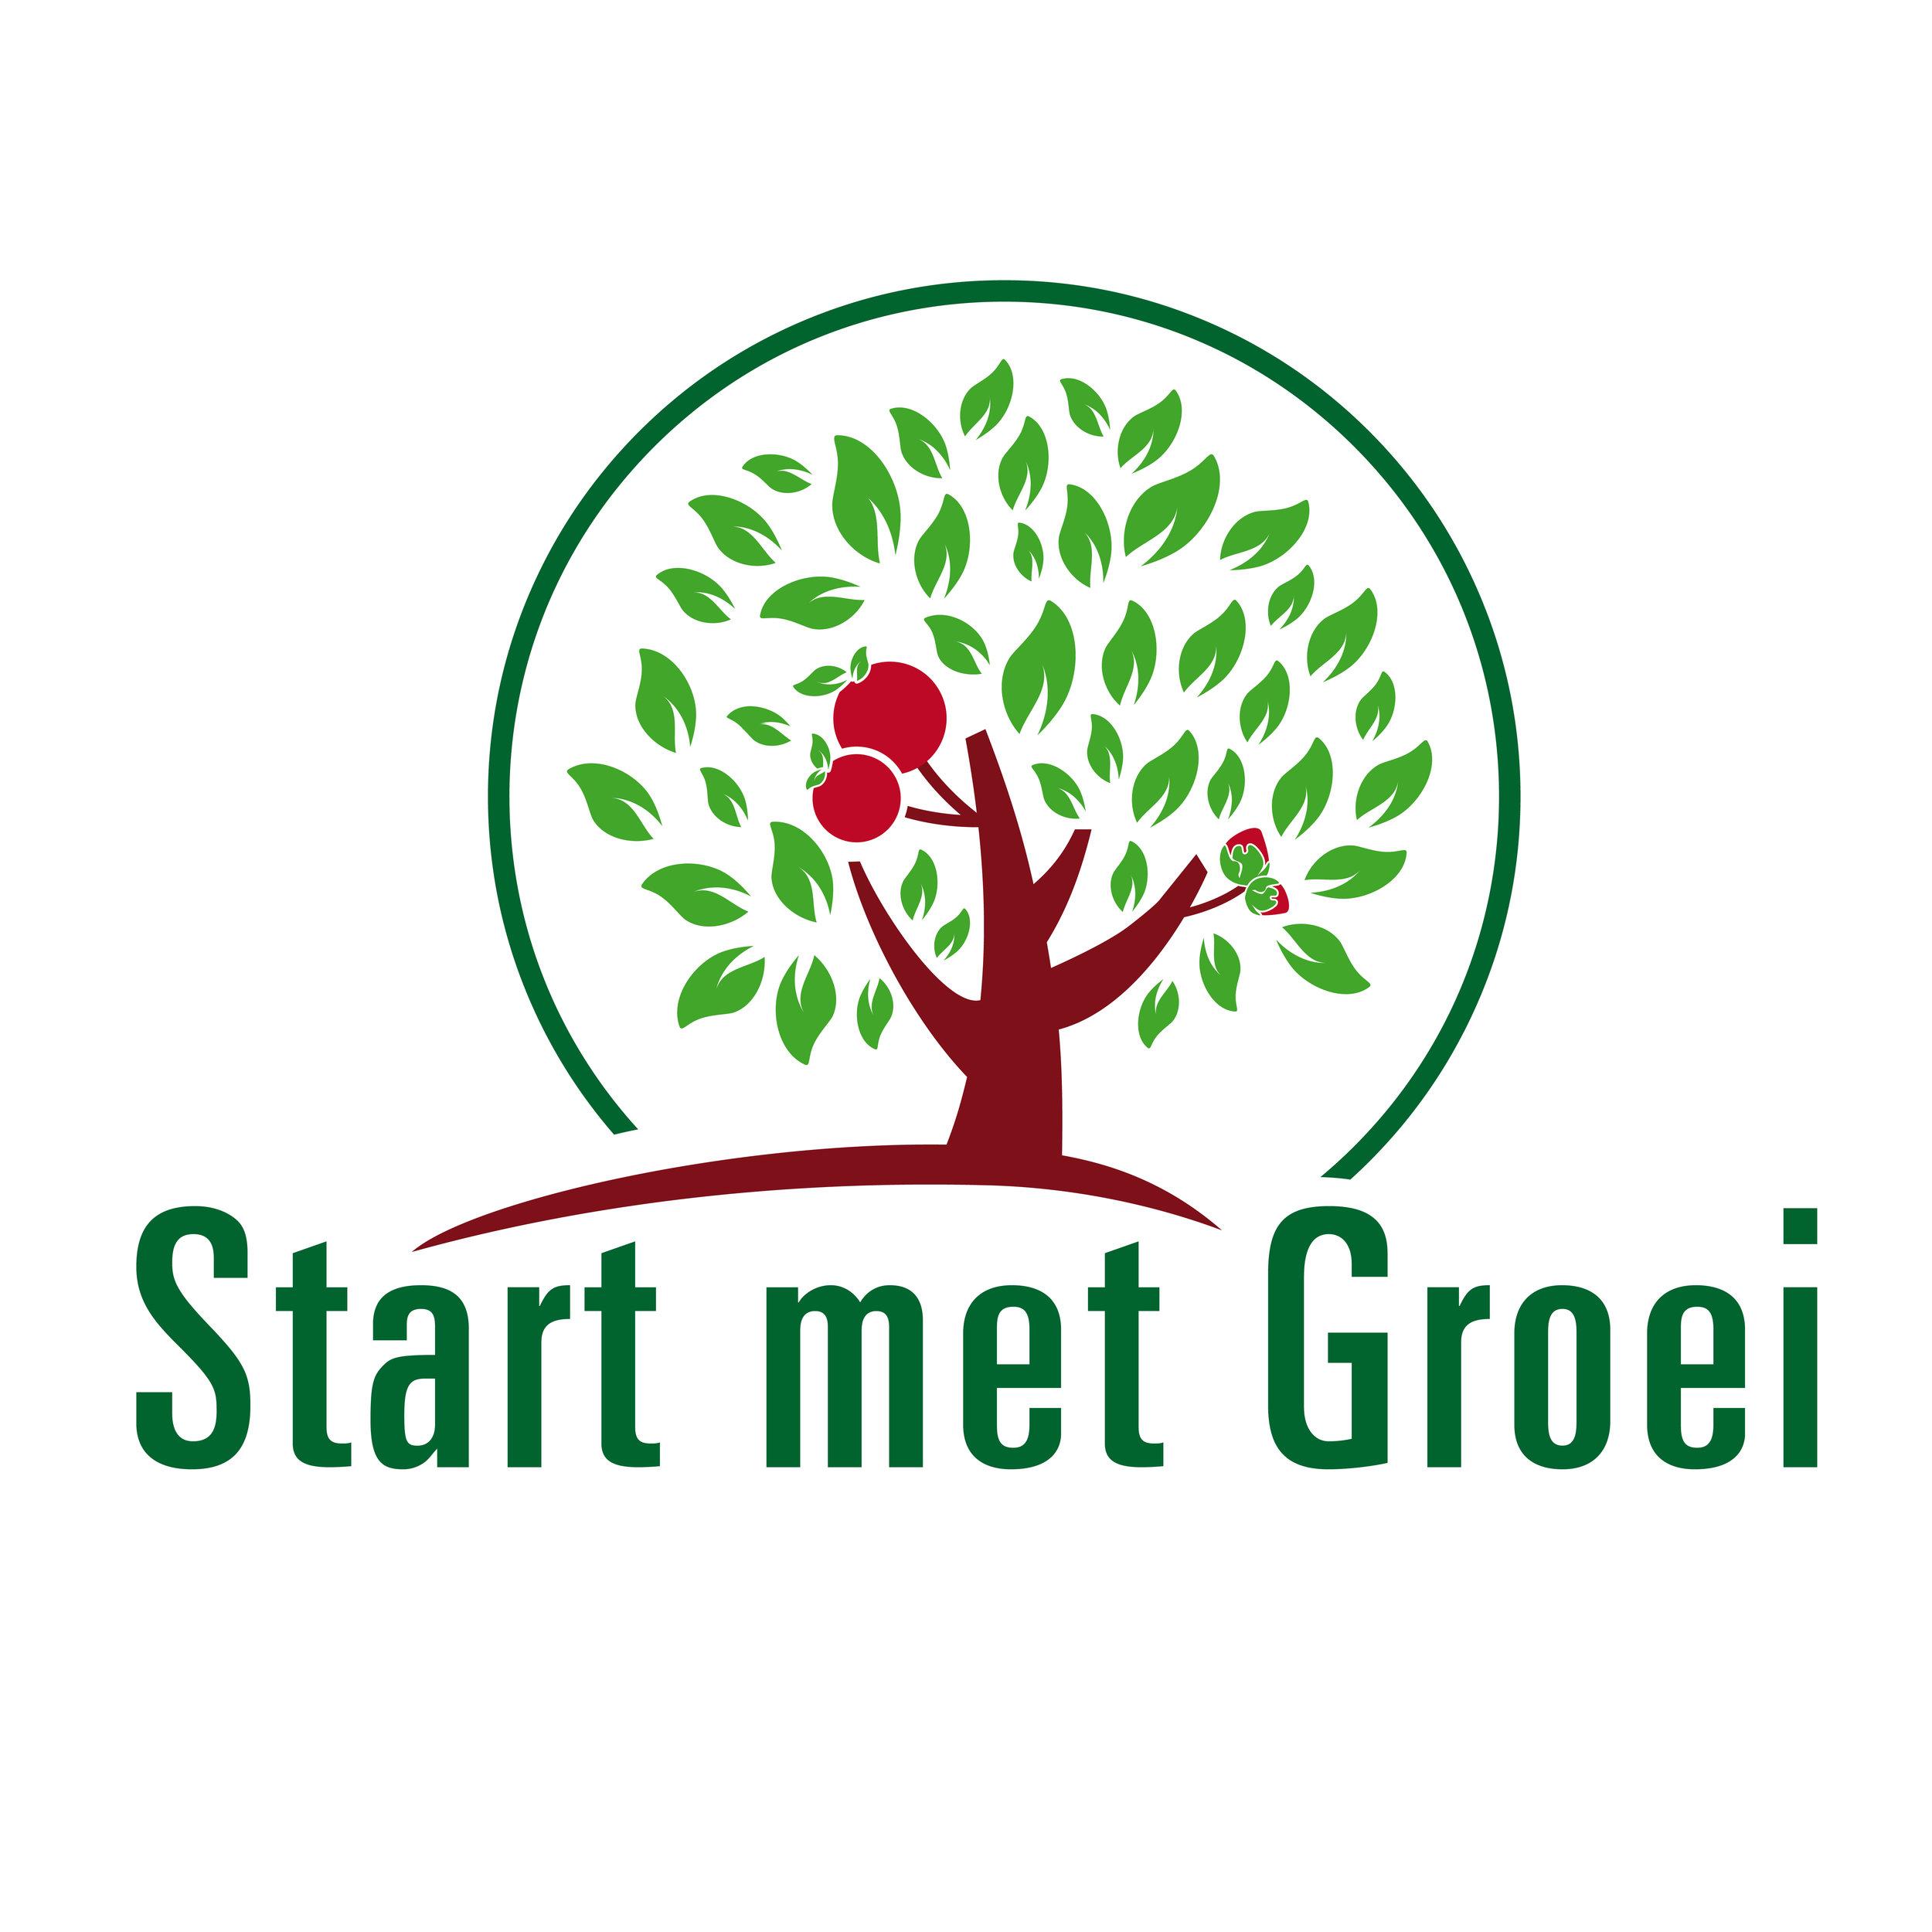 Start met Groei